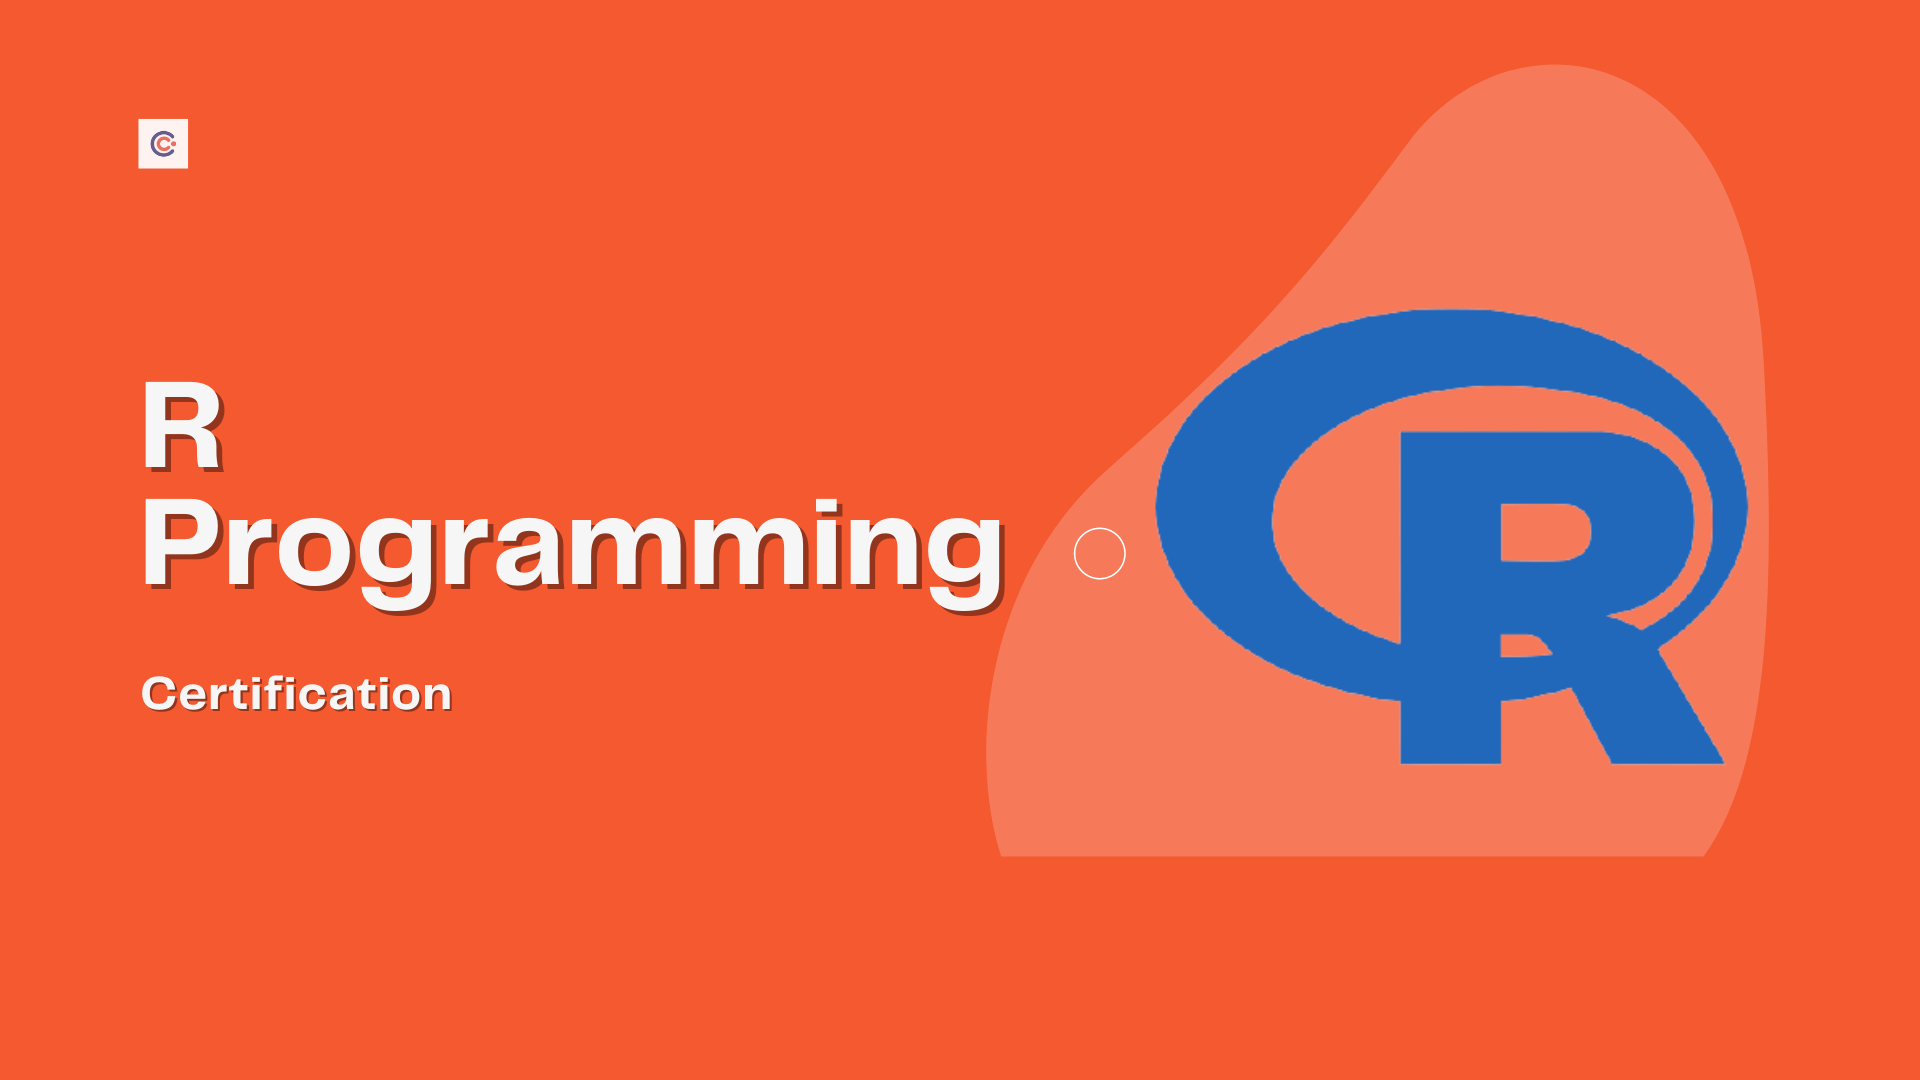 9 Best R Programming Certification Courses - Learn R Programming Online